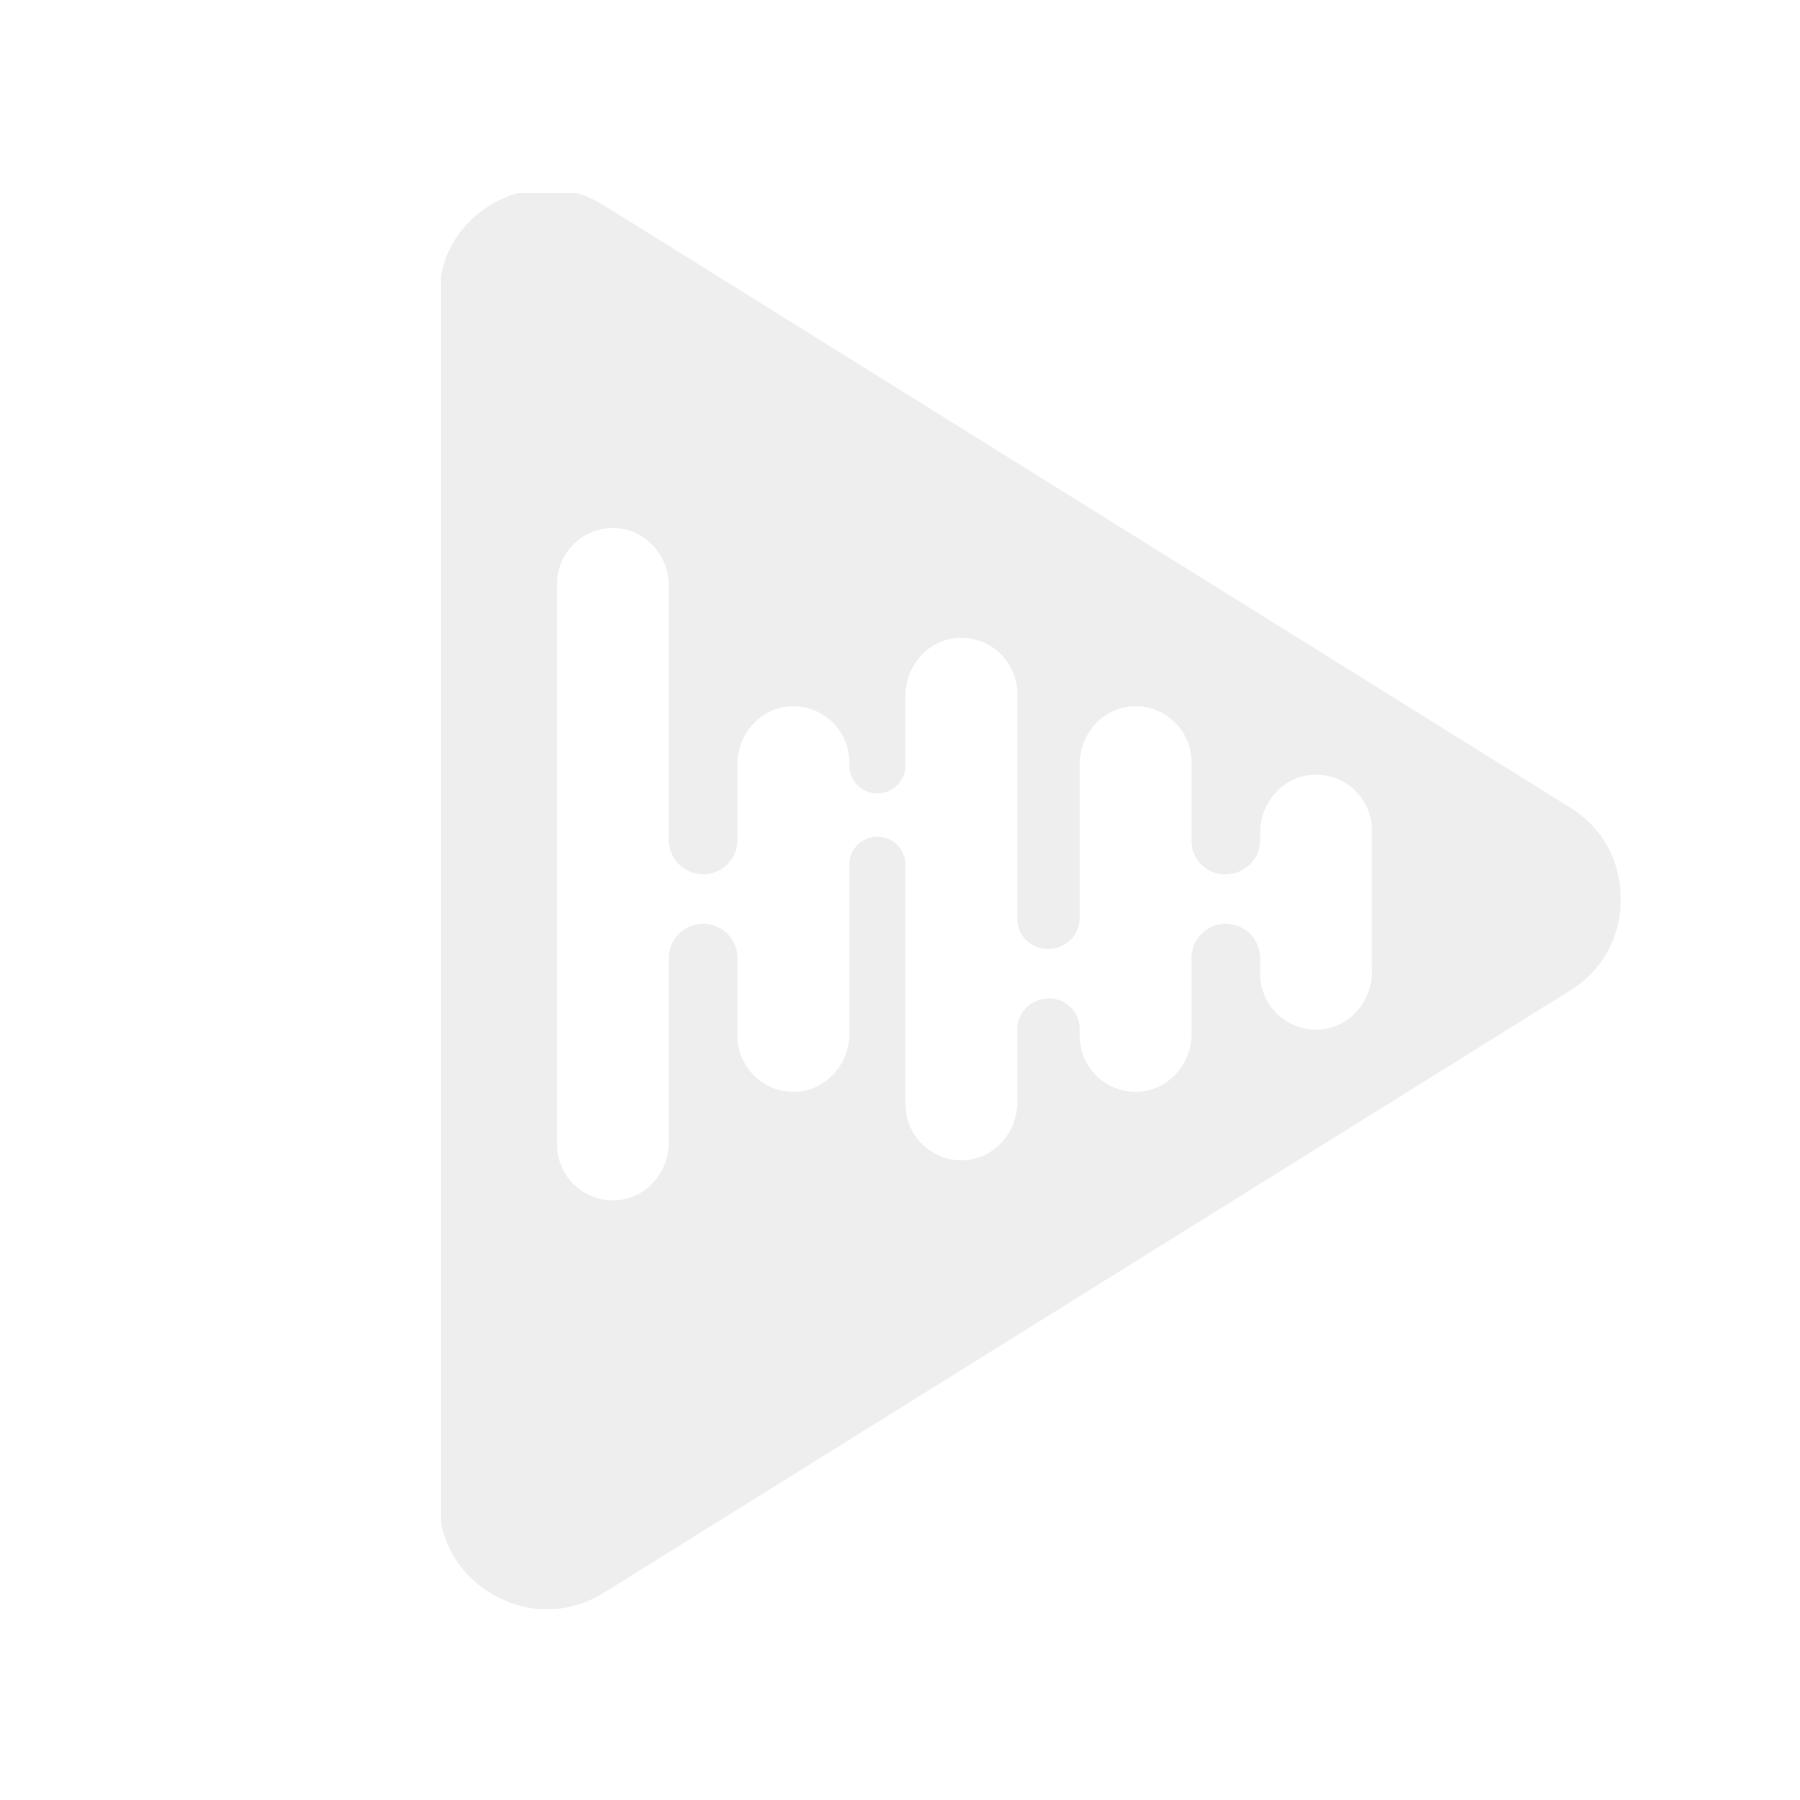 Skoddejuice Jamaican Rum Aroma